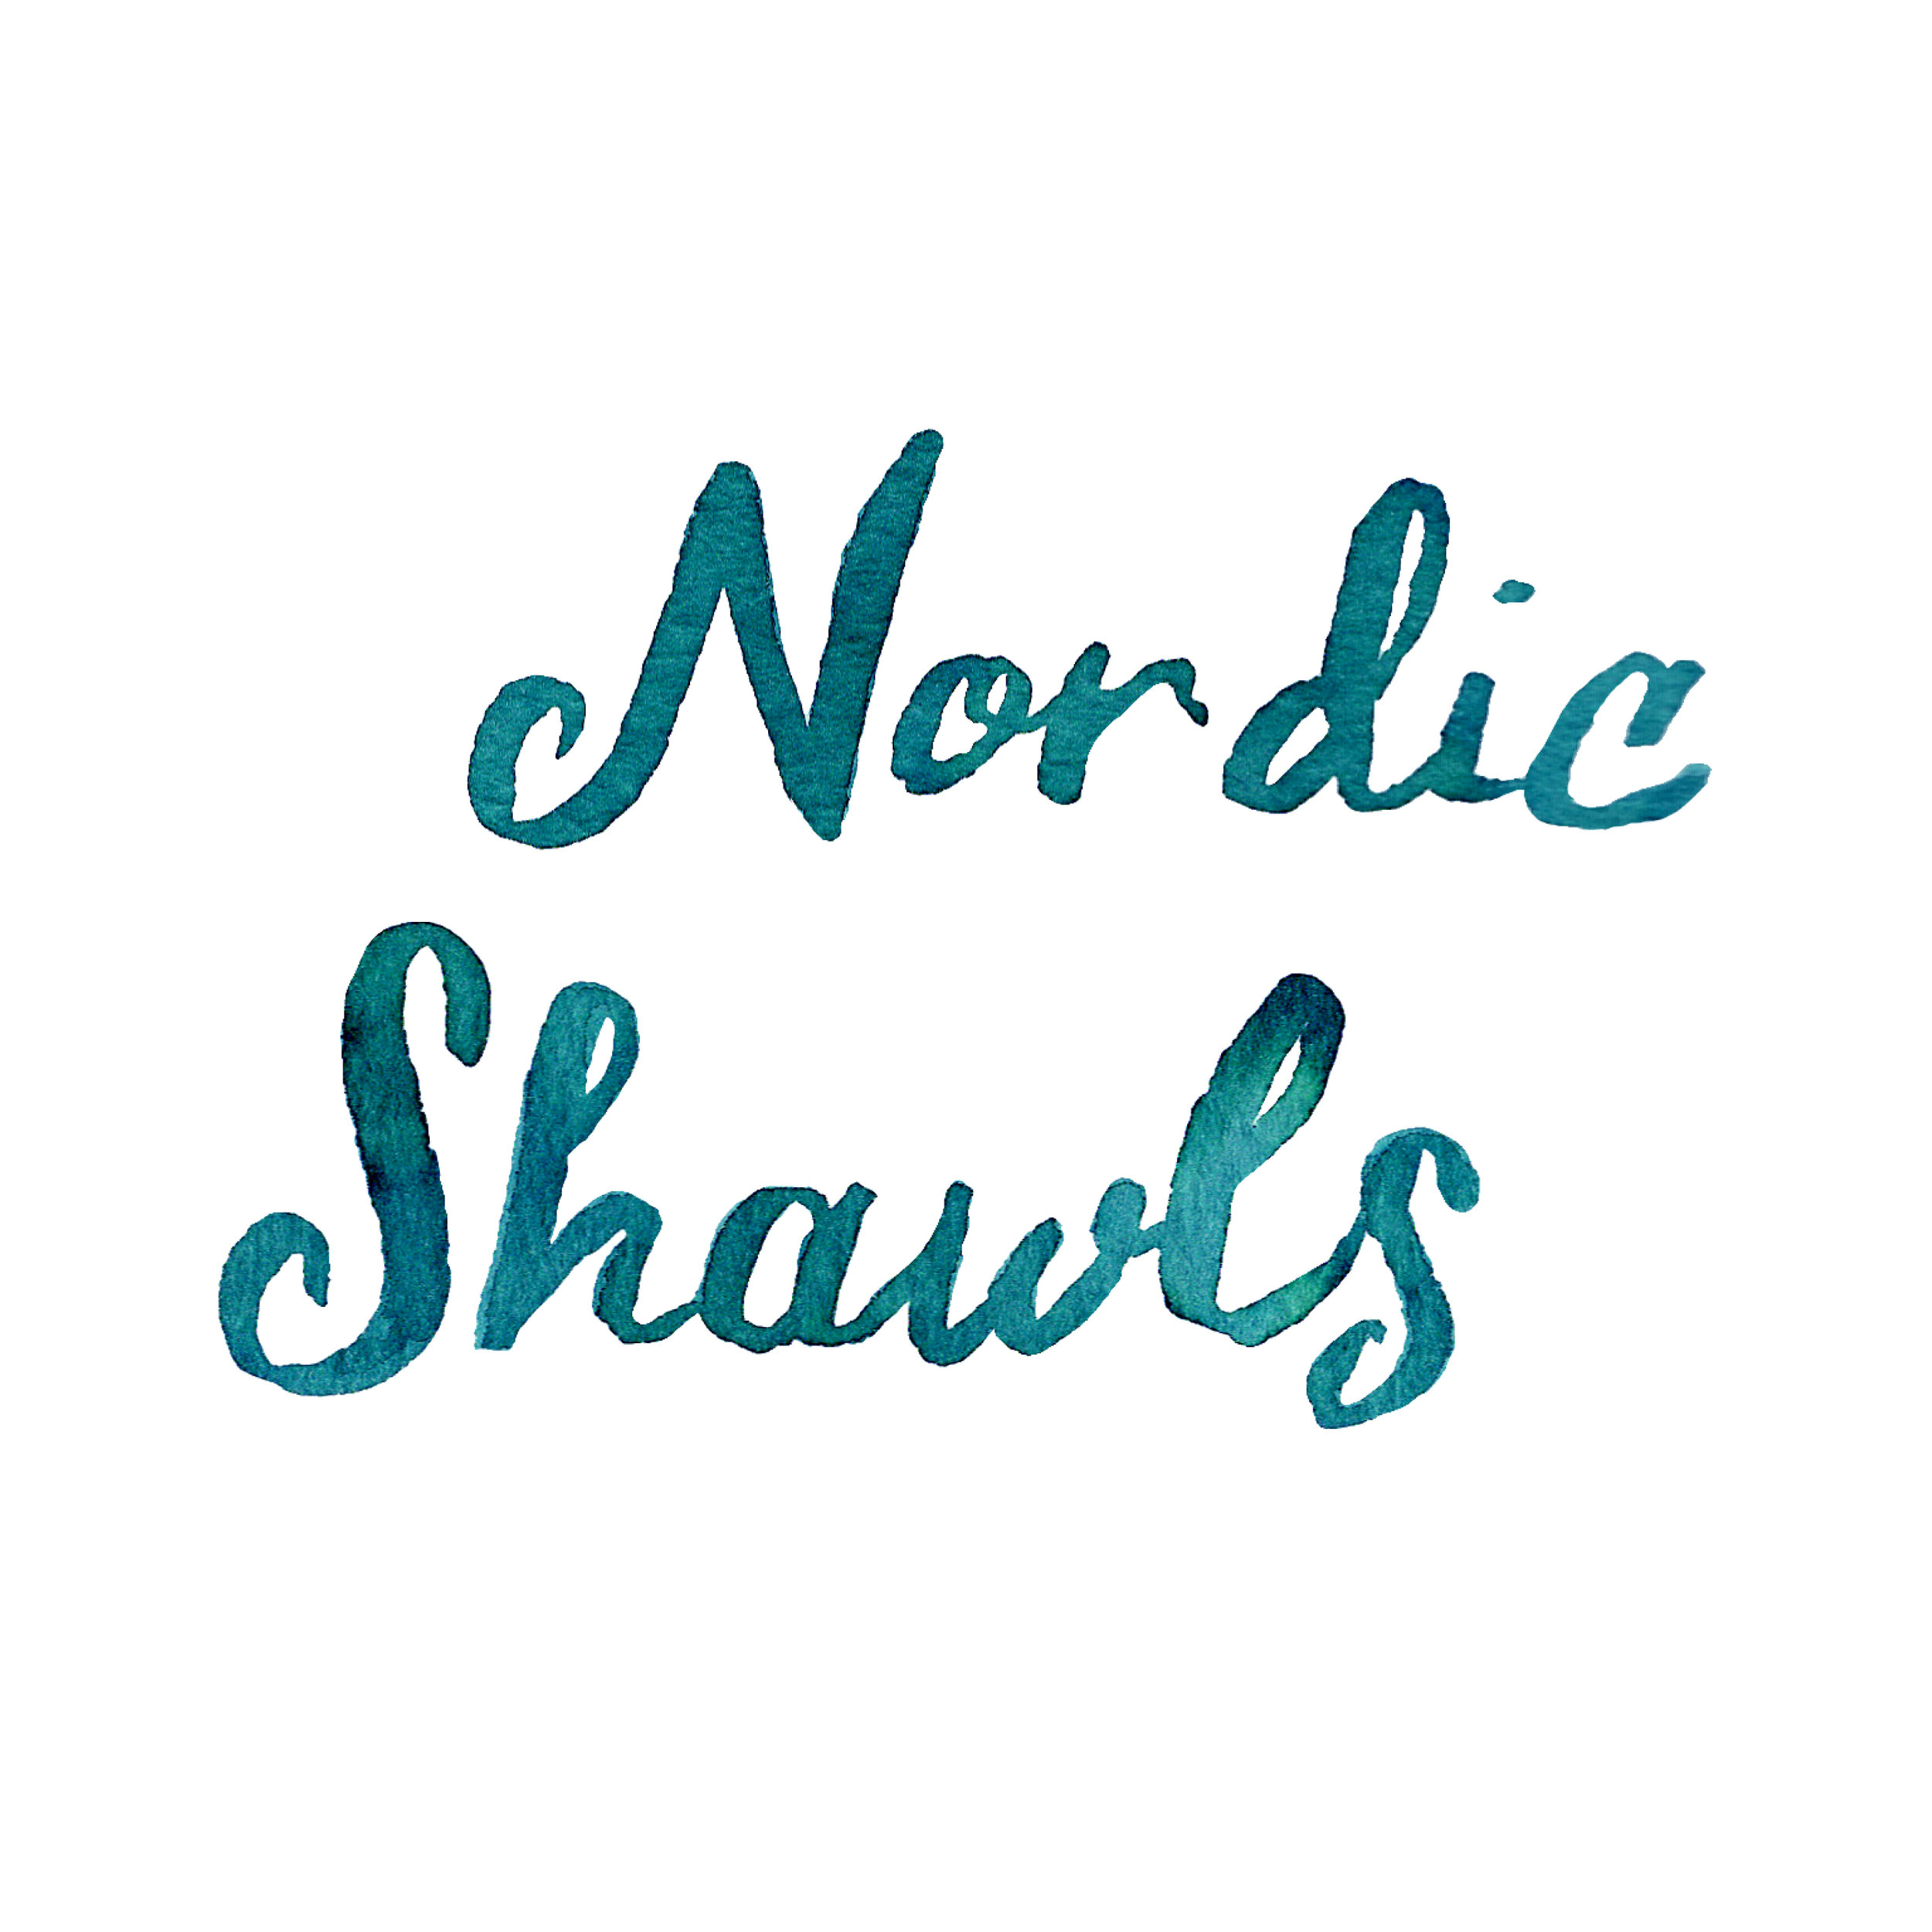 NordicShawls_sq.jpg